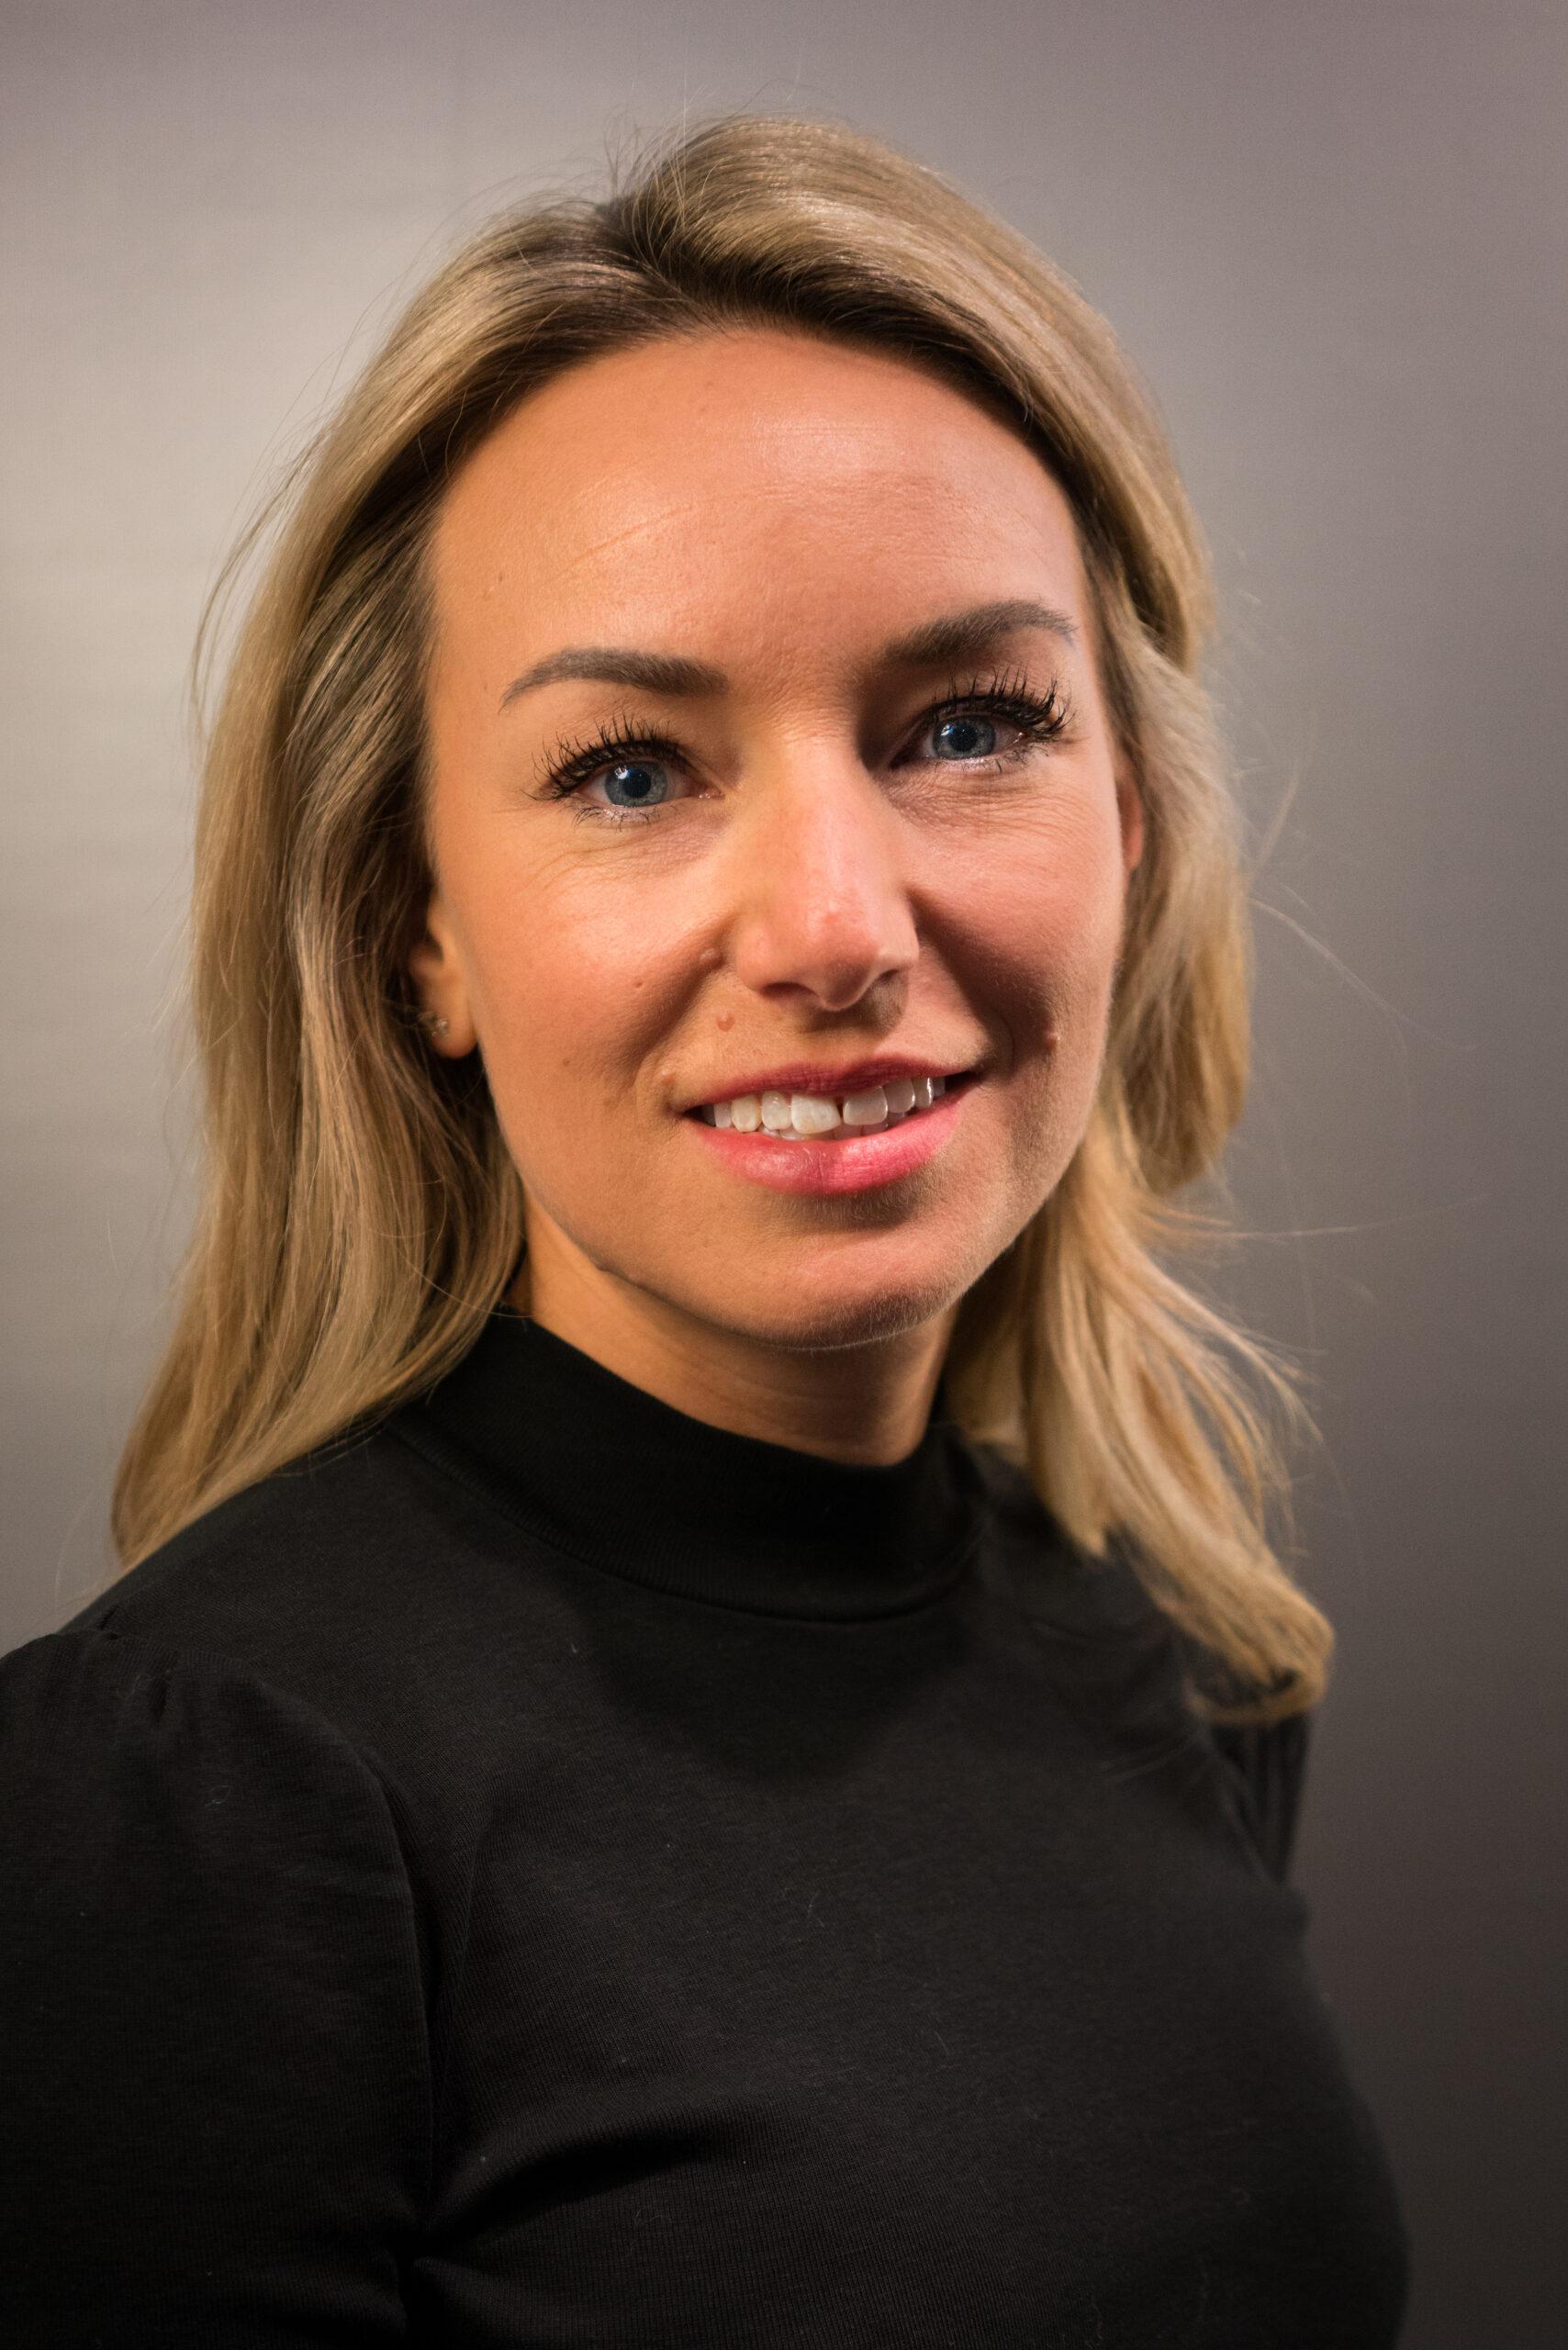 Chelsea Coyle